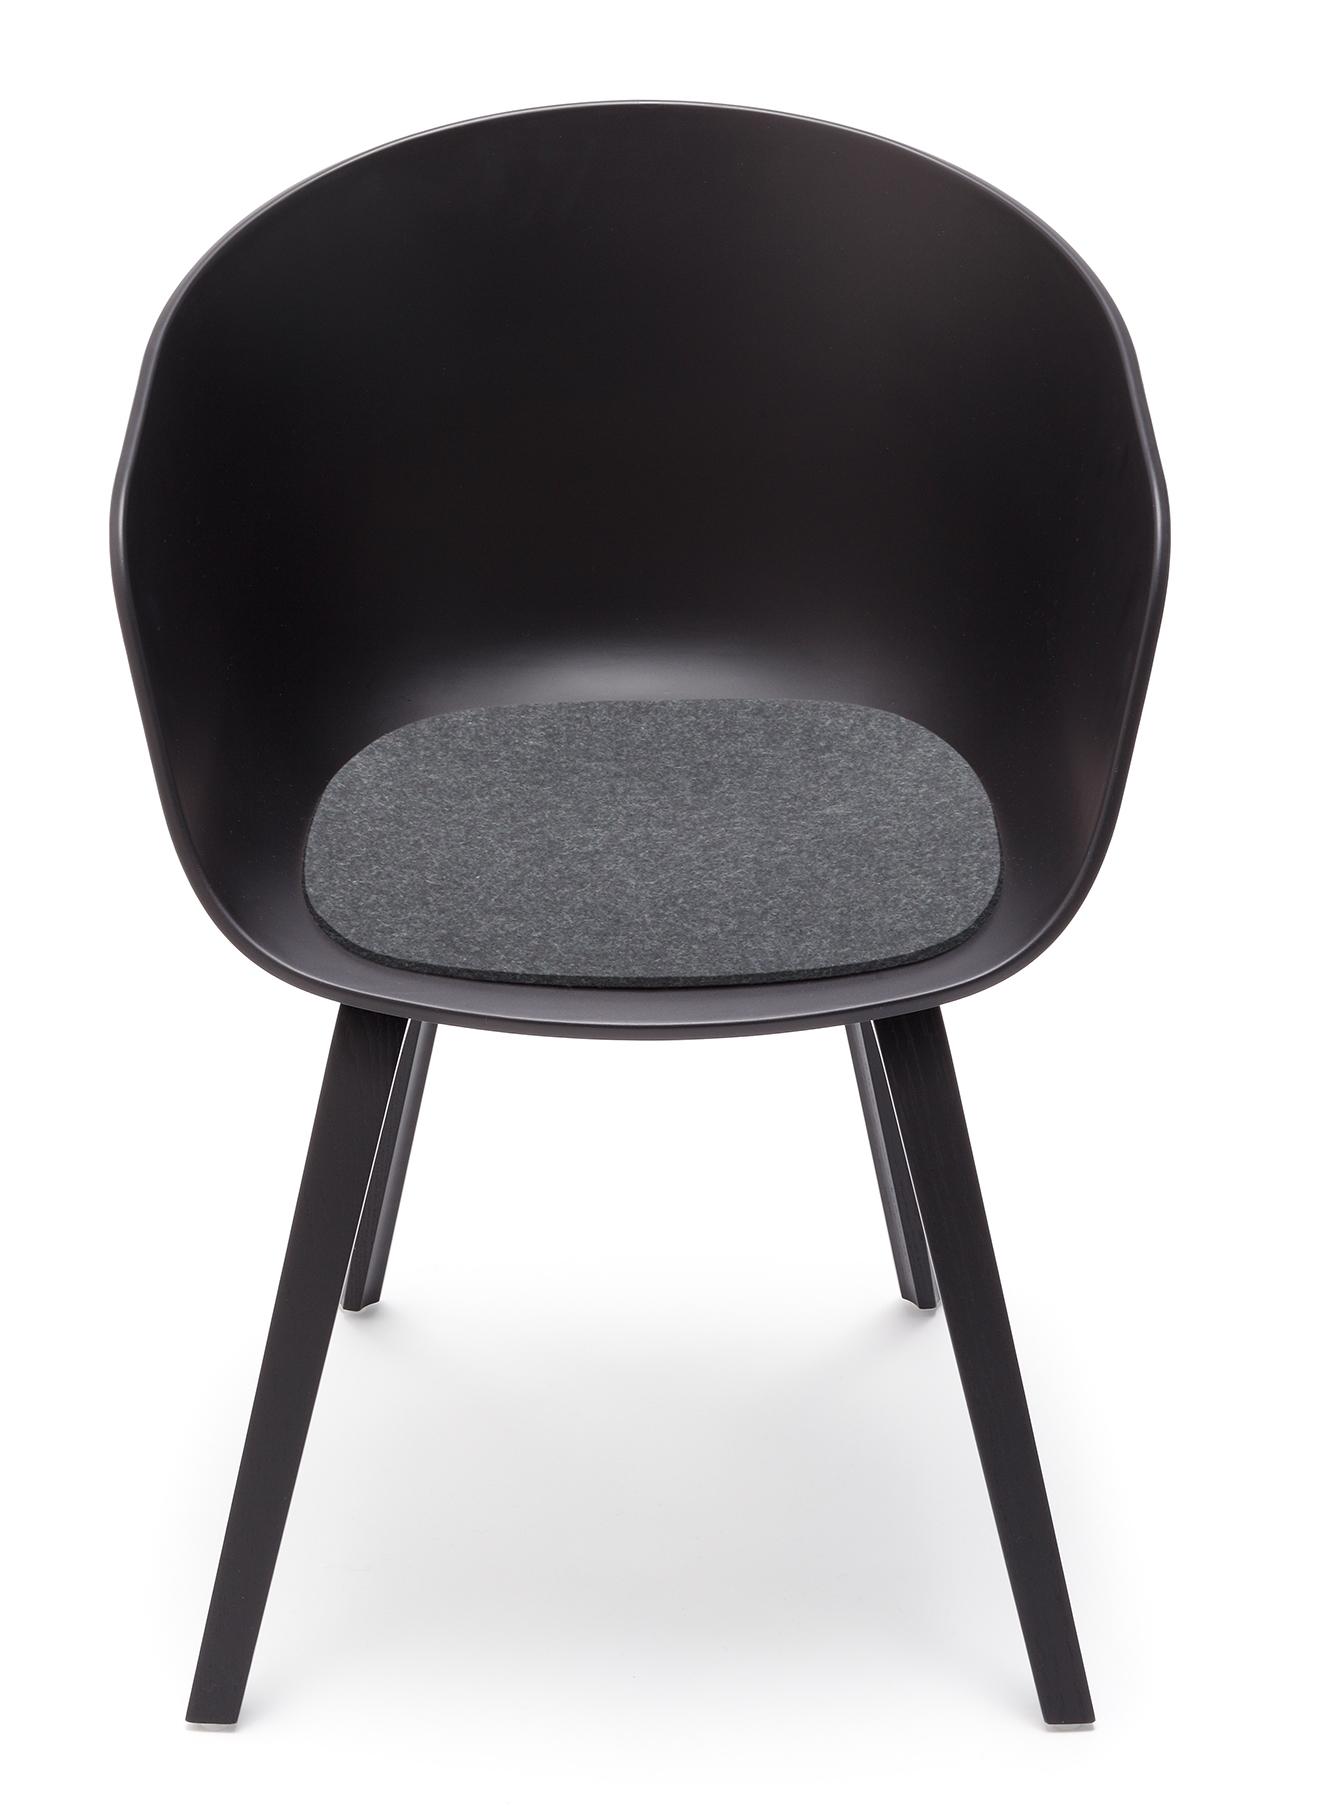 Sitzauflage - Filzauflage About A Chair AAC22 / AAC 22 Schoko Hey Sign